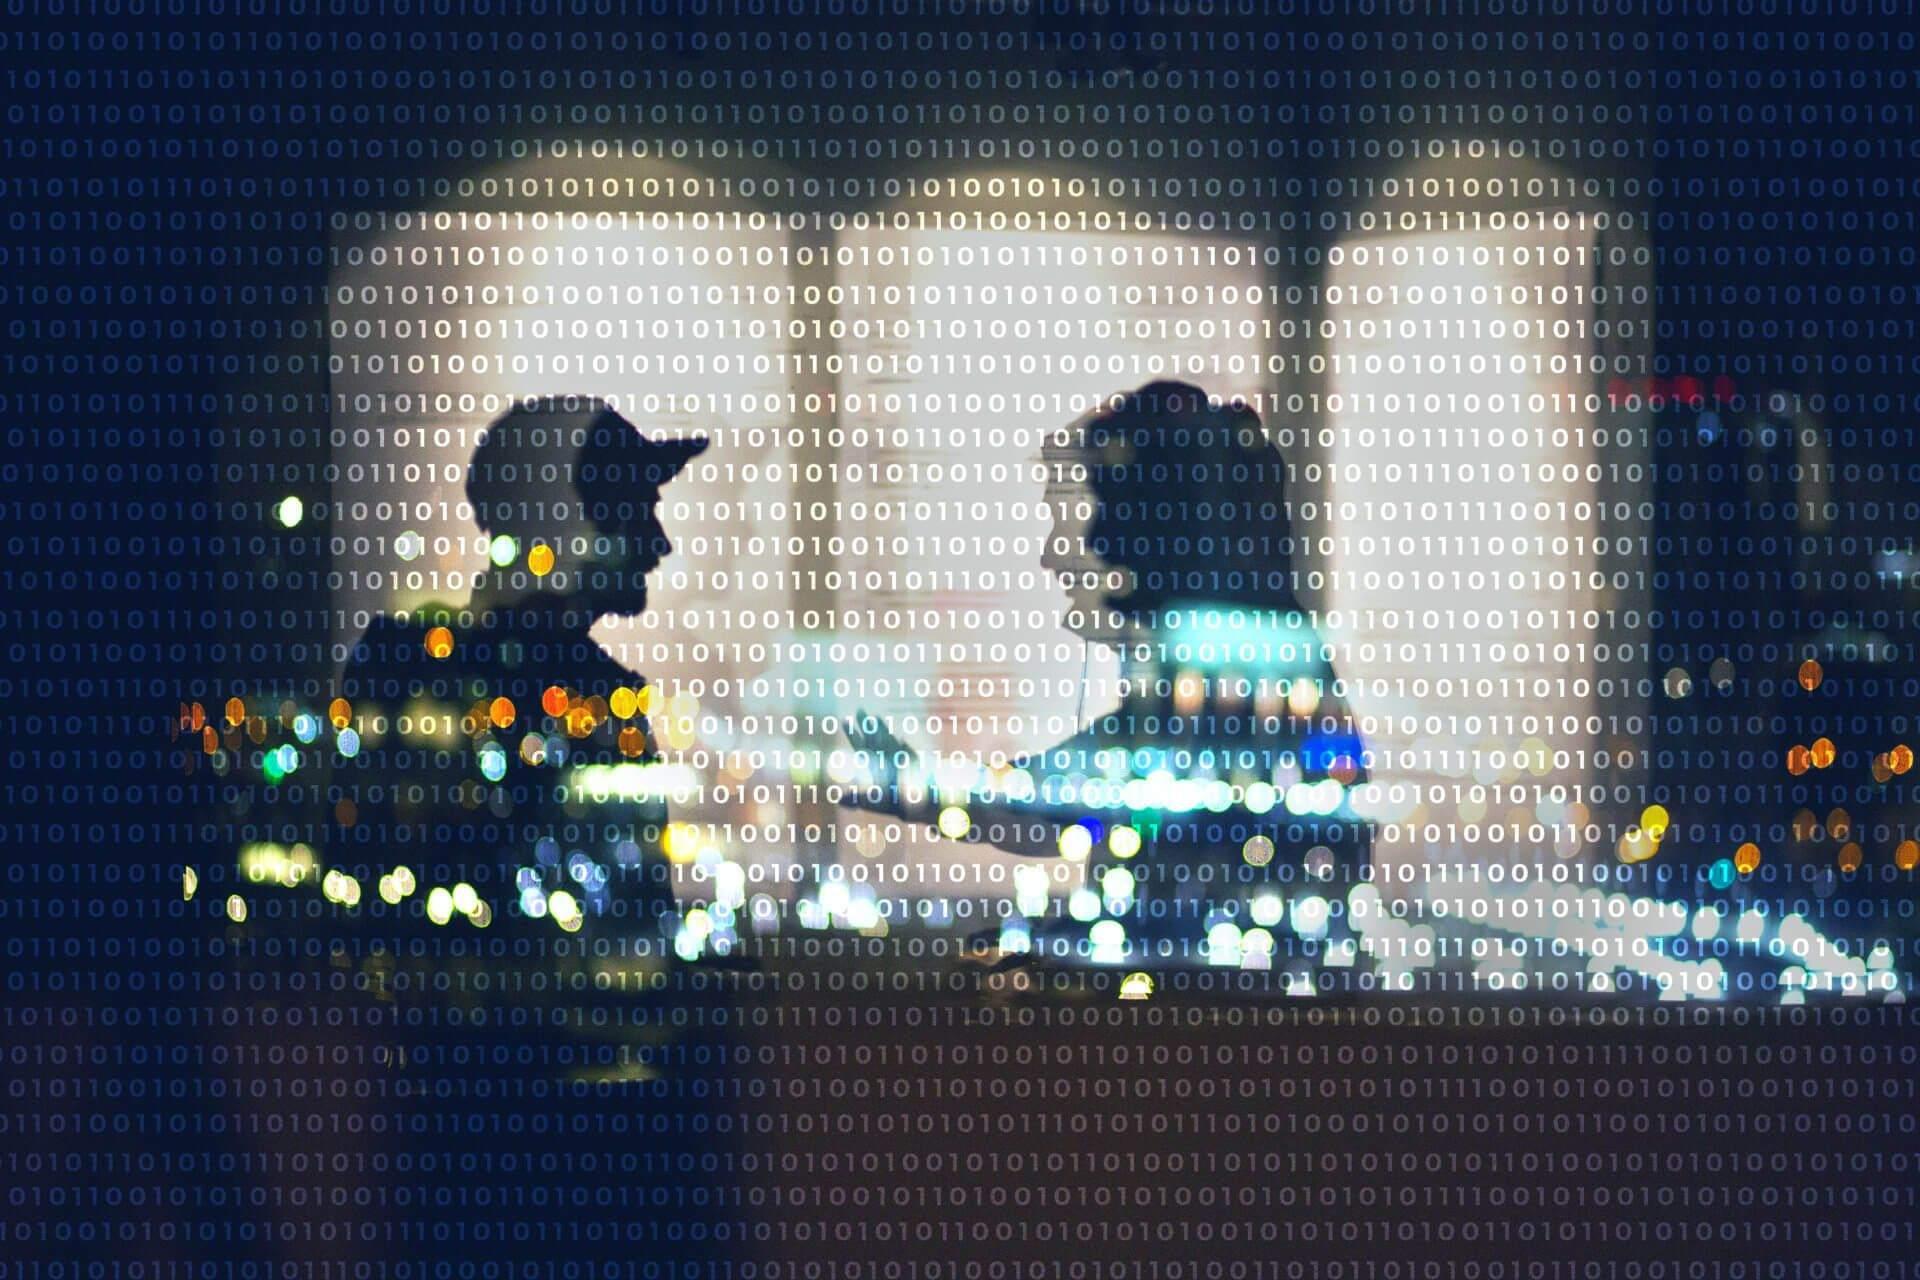 pxl-vision_blog